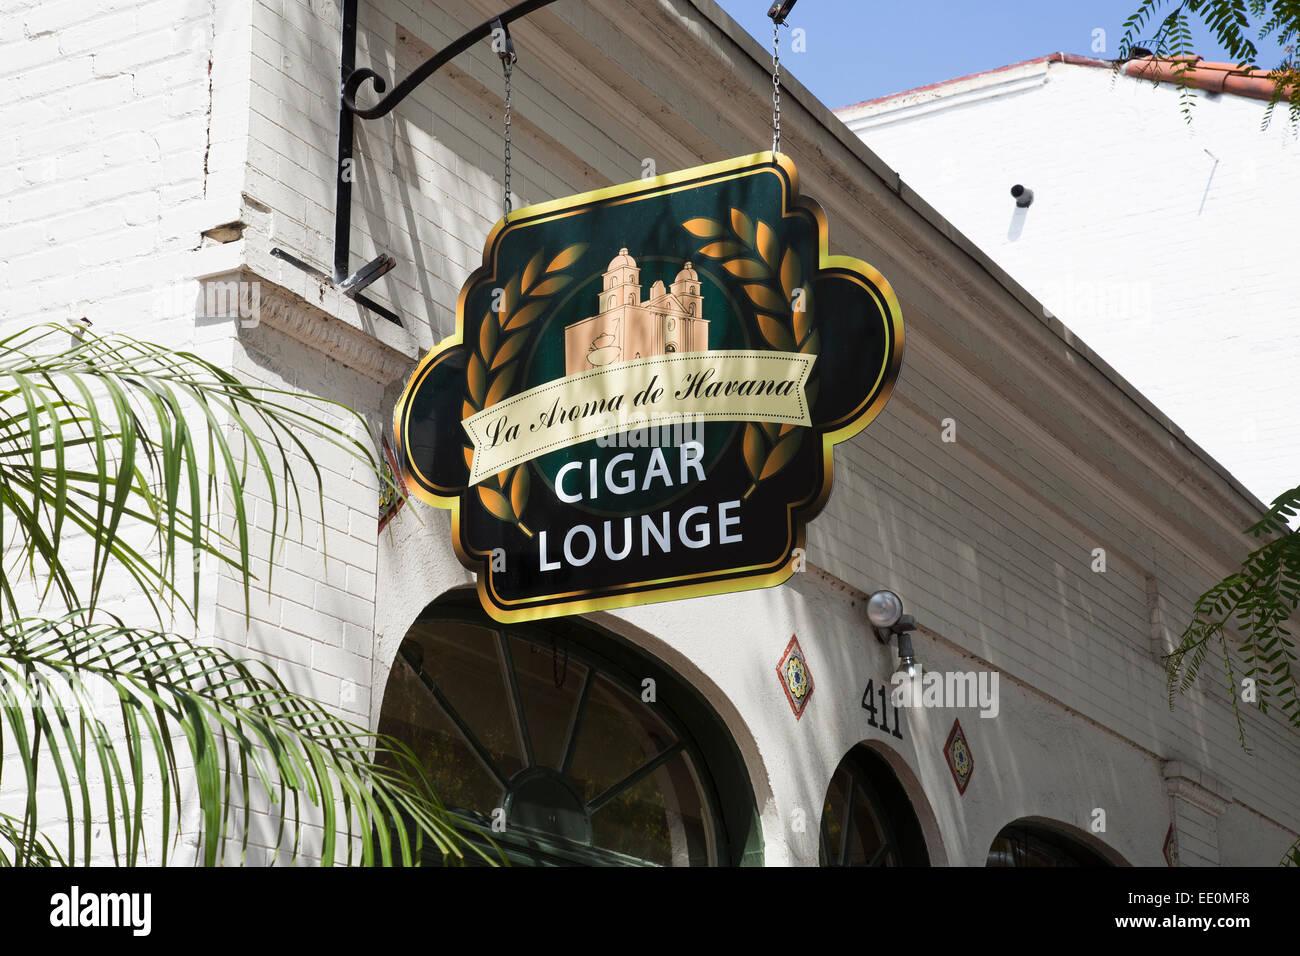 La Aroma de Havana Cigar Lounge on State Street, Santa Barbara, California - Stock Image